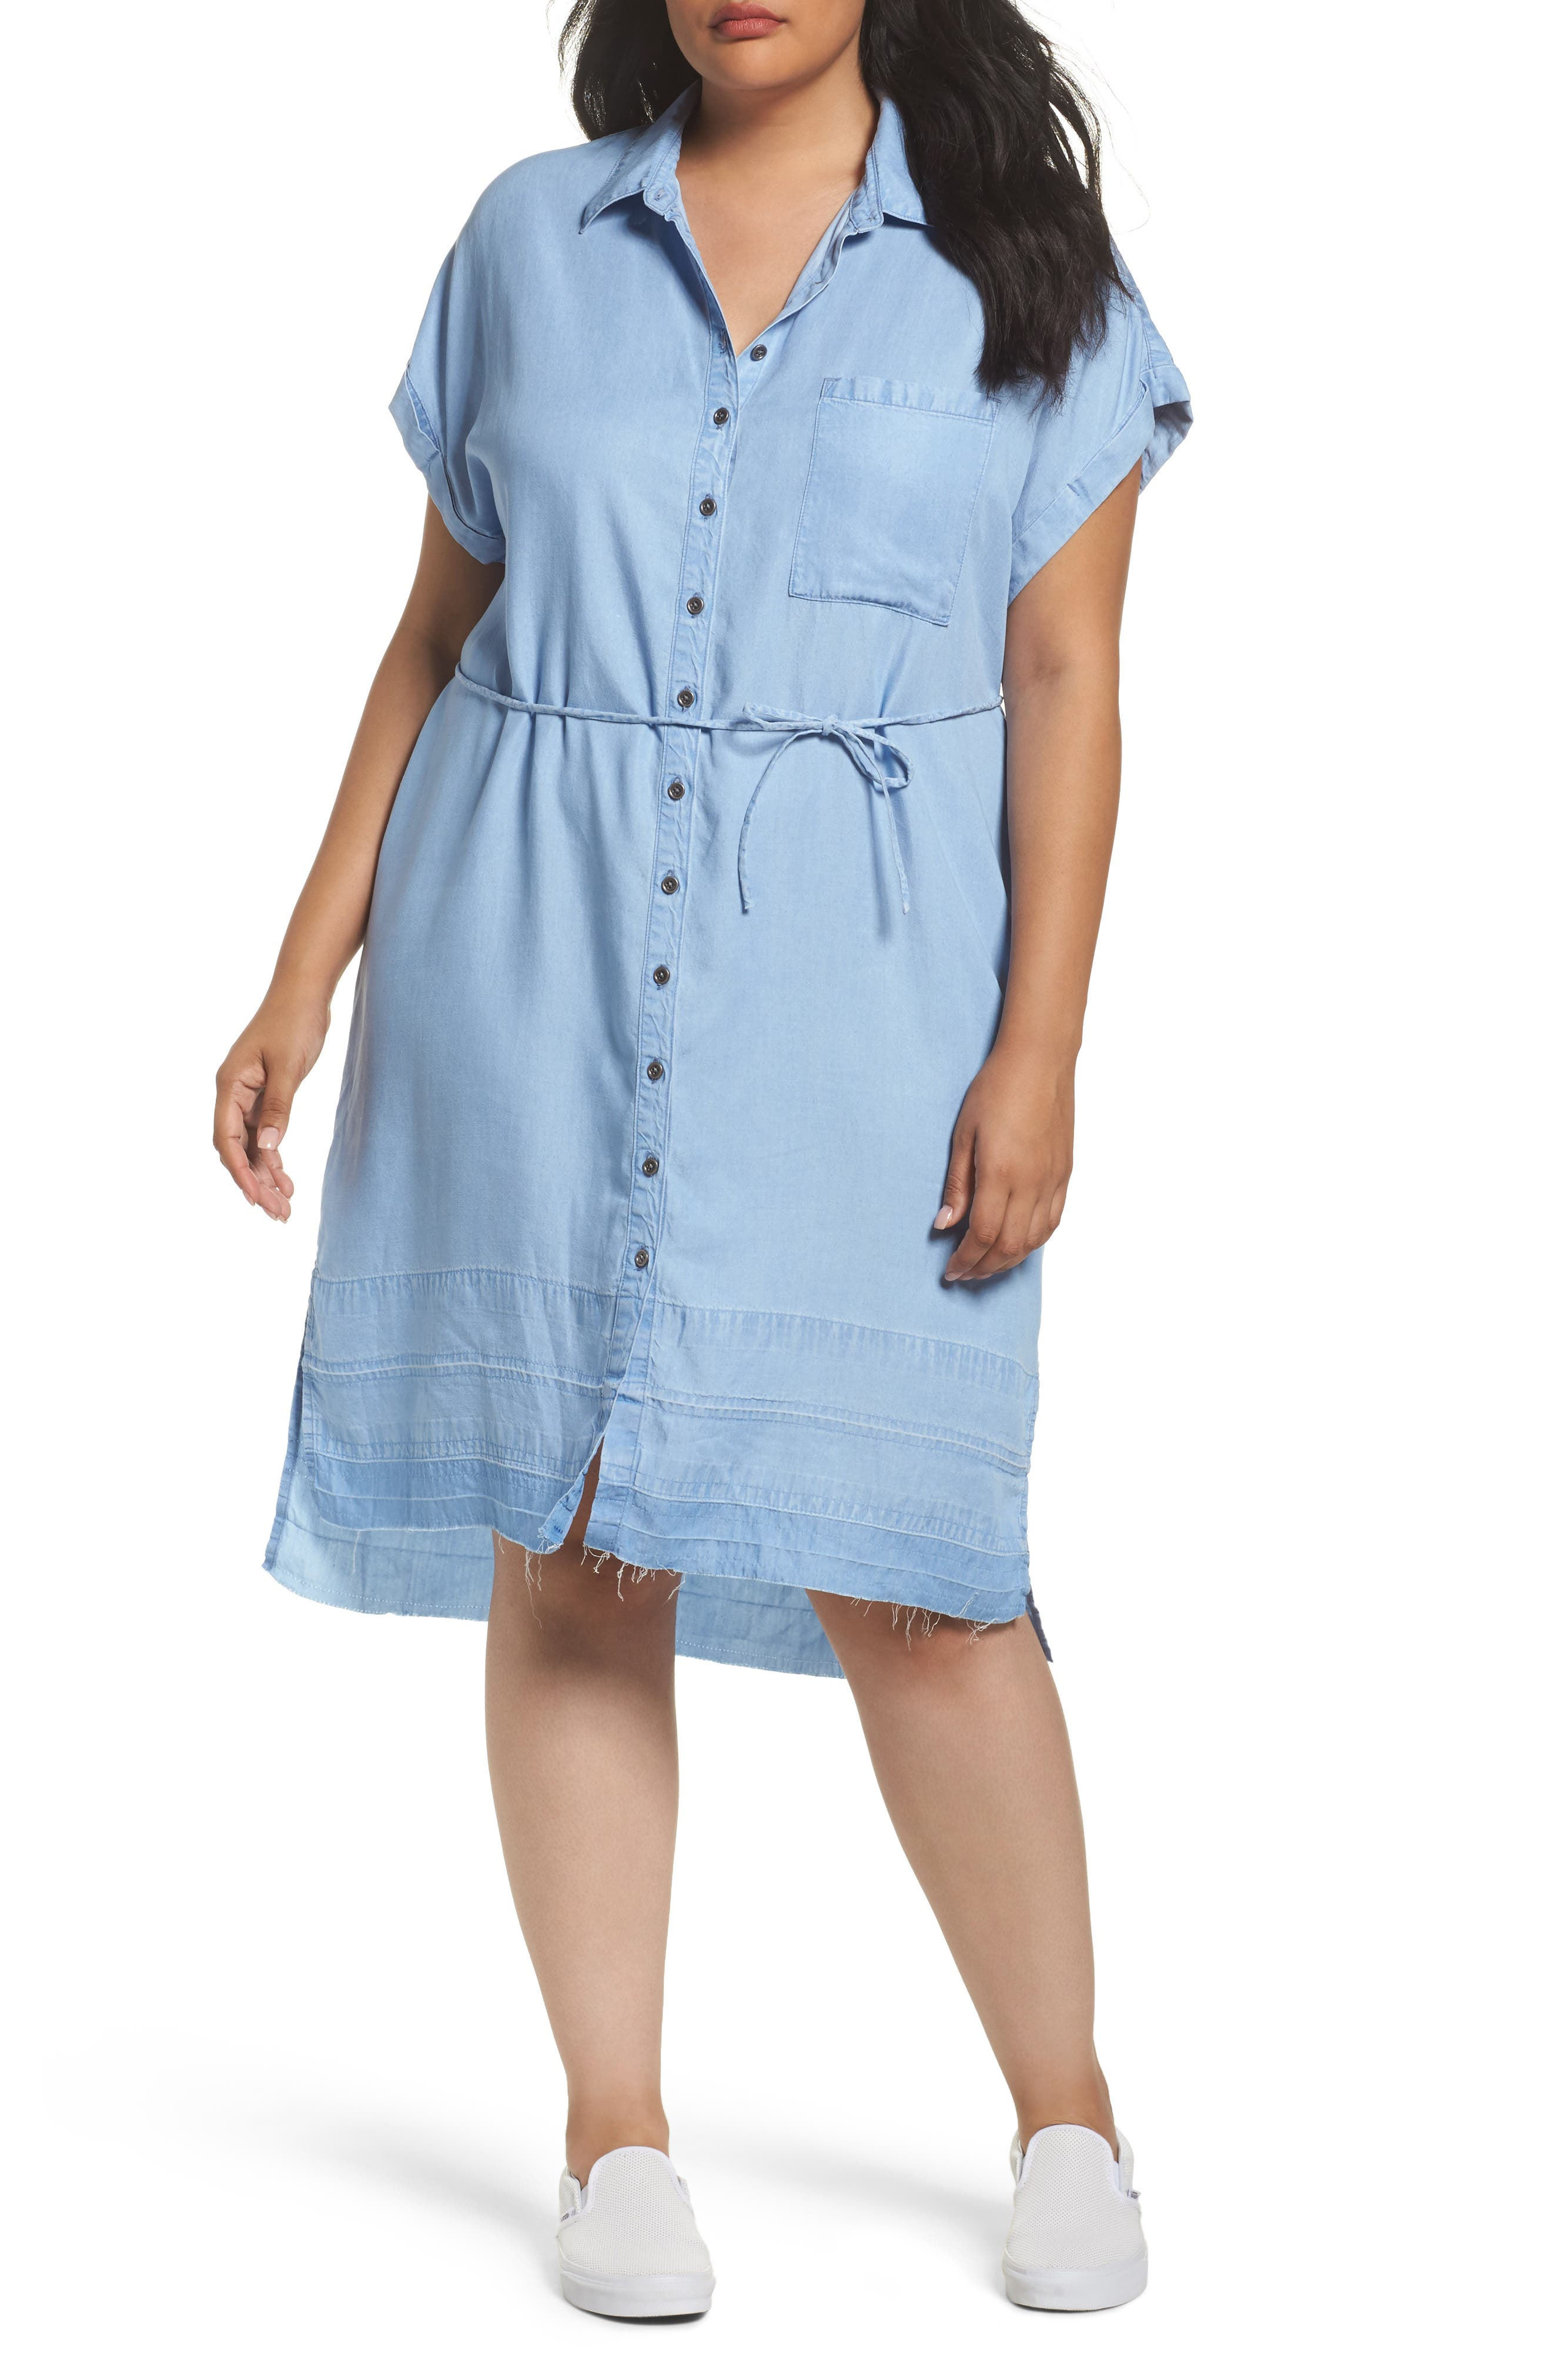 Main Image - Rebel Wilson x Angels Chambray Button-Up Shirtdress (Plus Size)